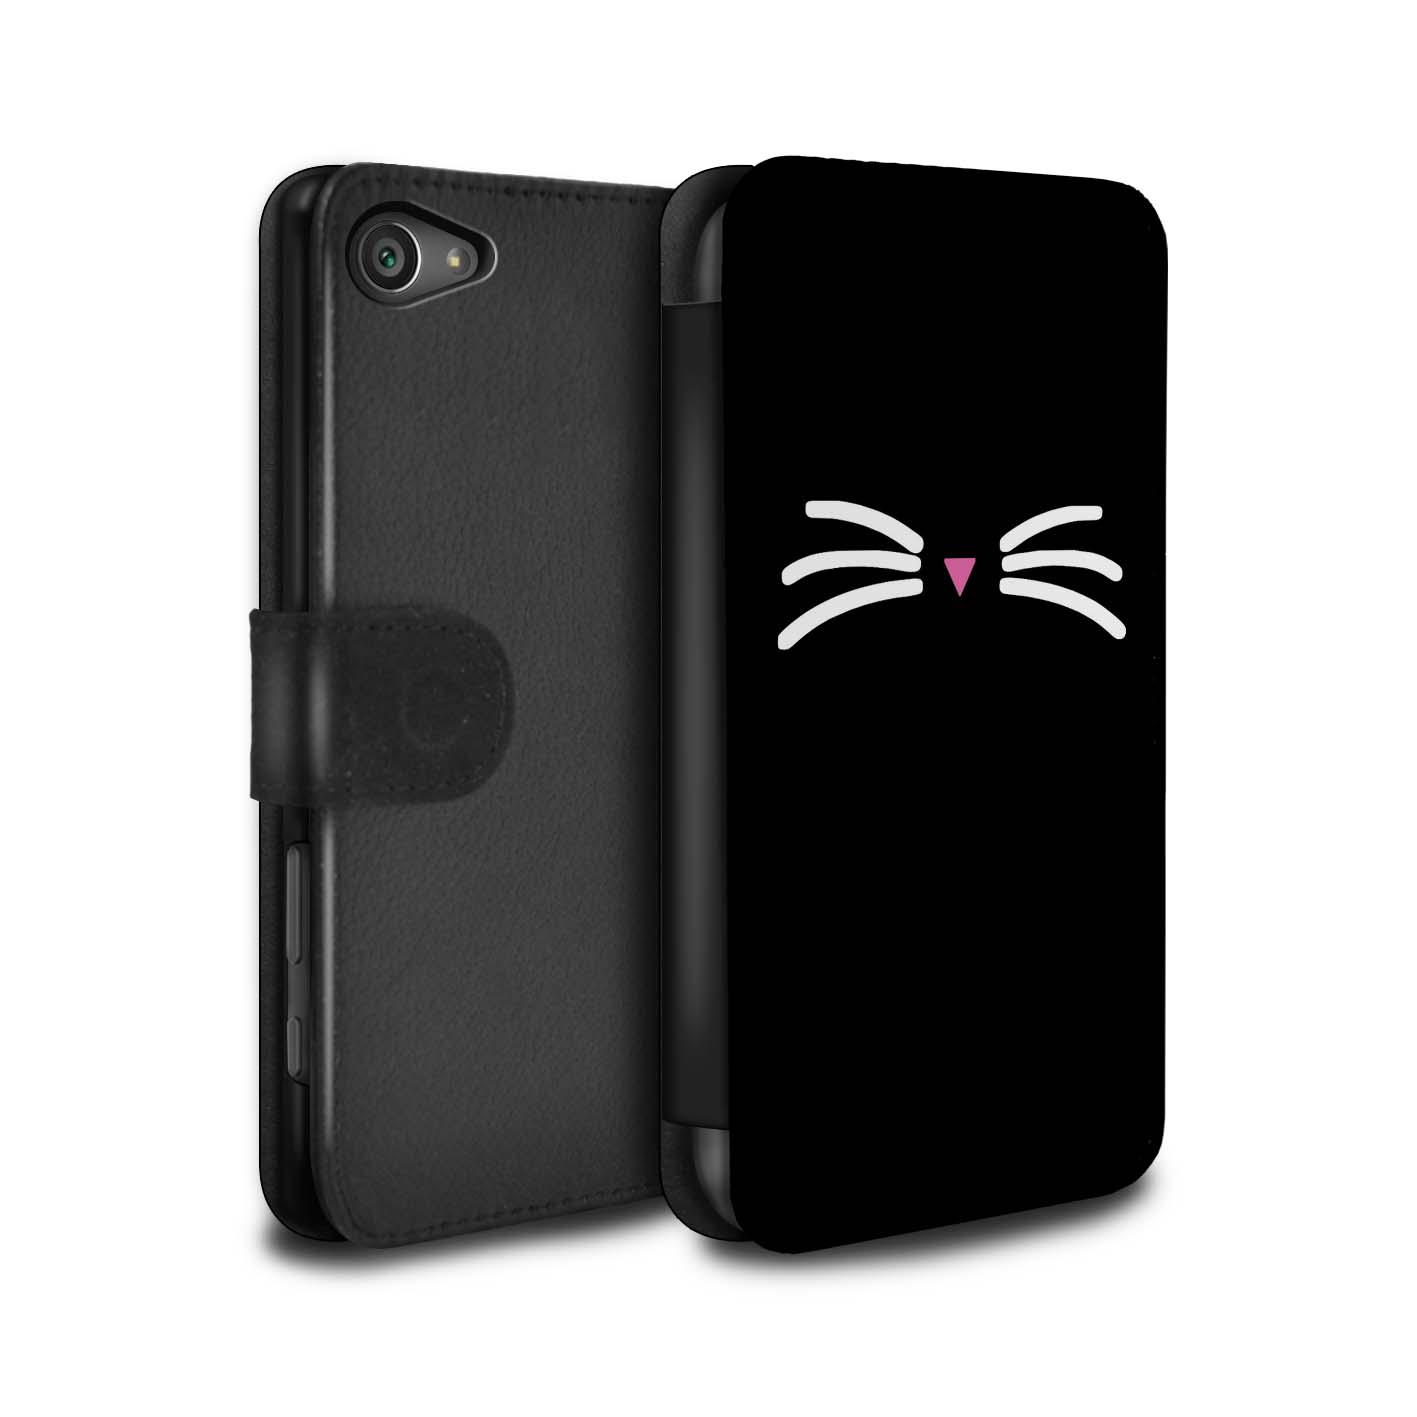 Coque-Etui-Case-Cuir-PU-pour-Sony-Xperia-Z5-Compact-4-6-Chat-Mignon-Dessin-Anime